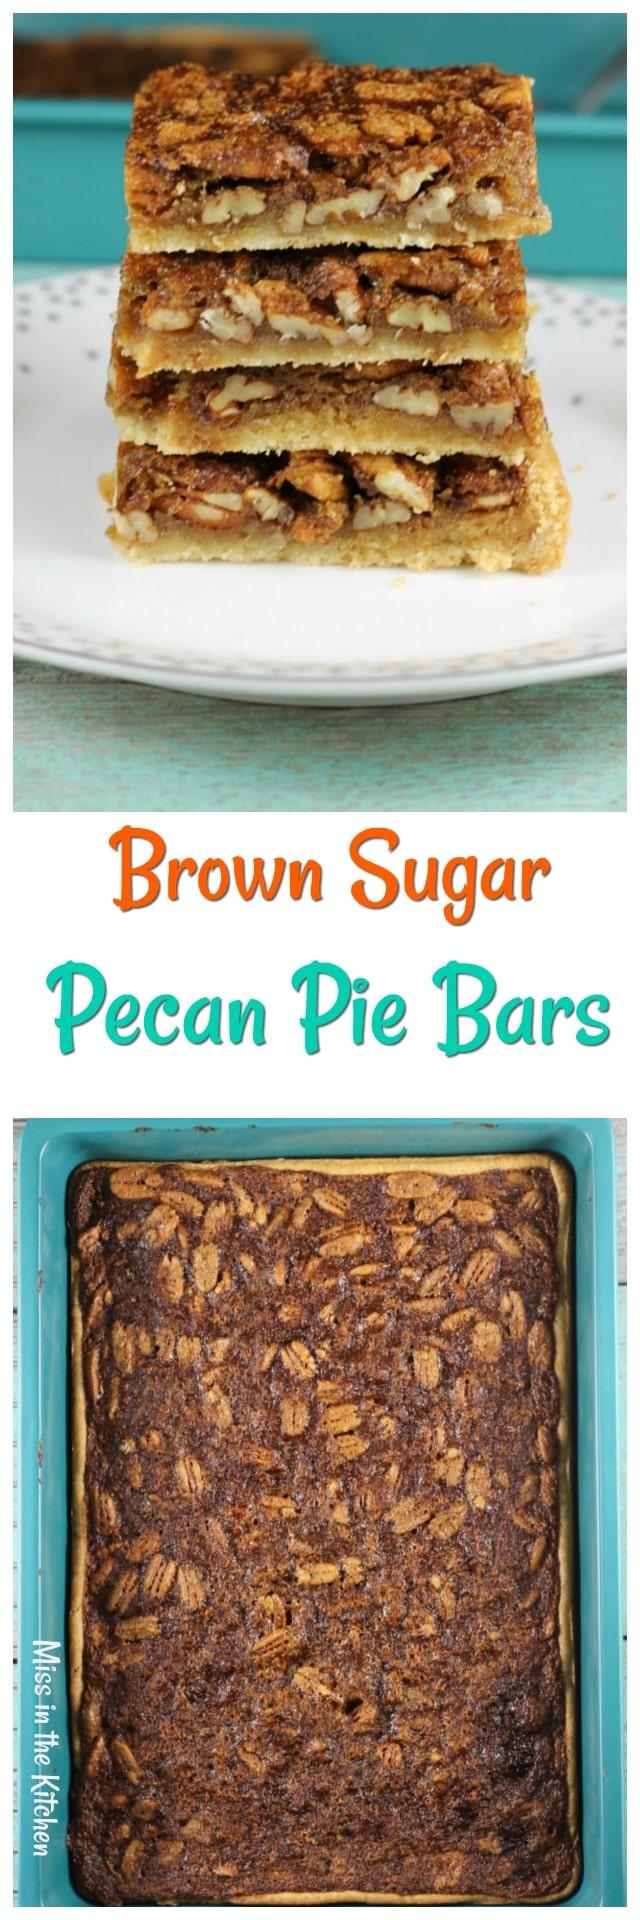 Brown Sugar Pecan Pie Bars Recipe are the perfect holiday treat! #Sponsored @Pillsbury & @Walmart #holiday #pecan #pie #dessert